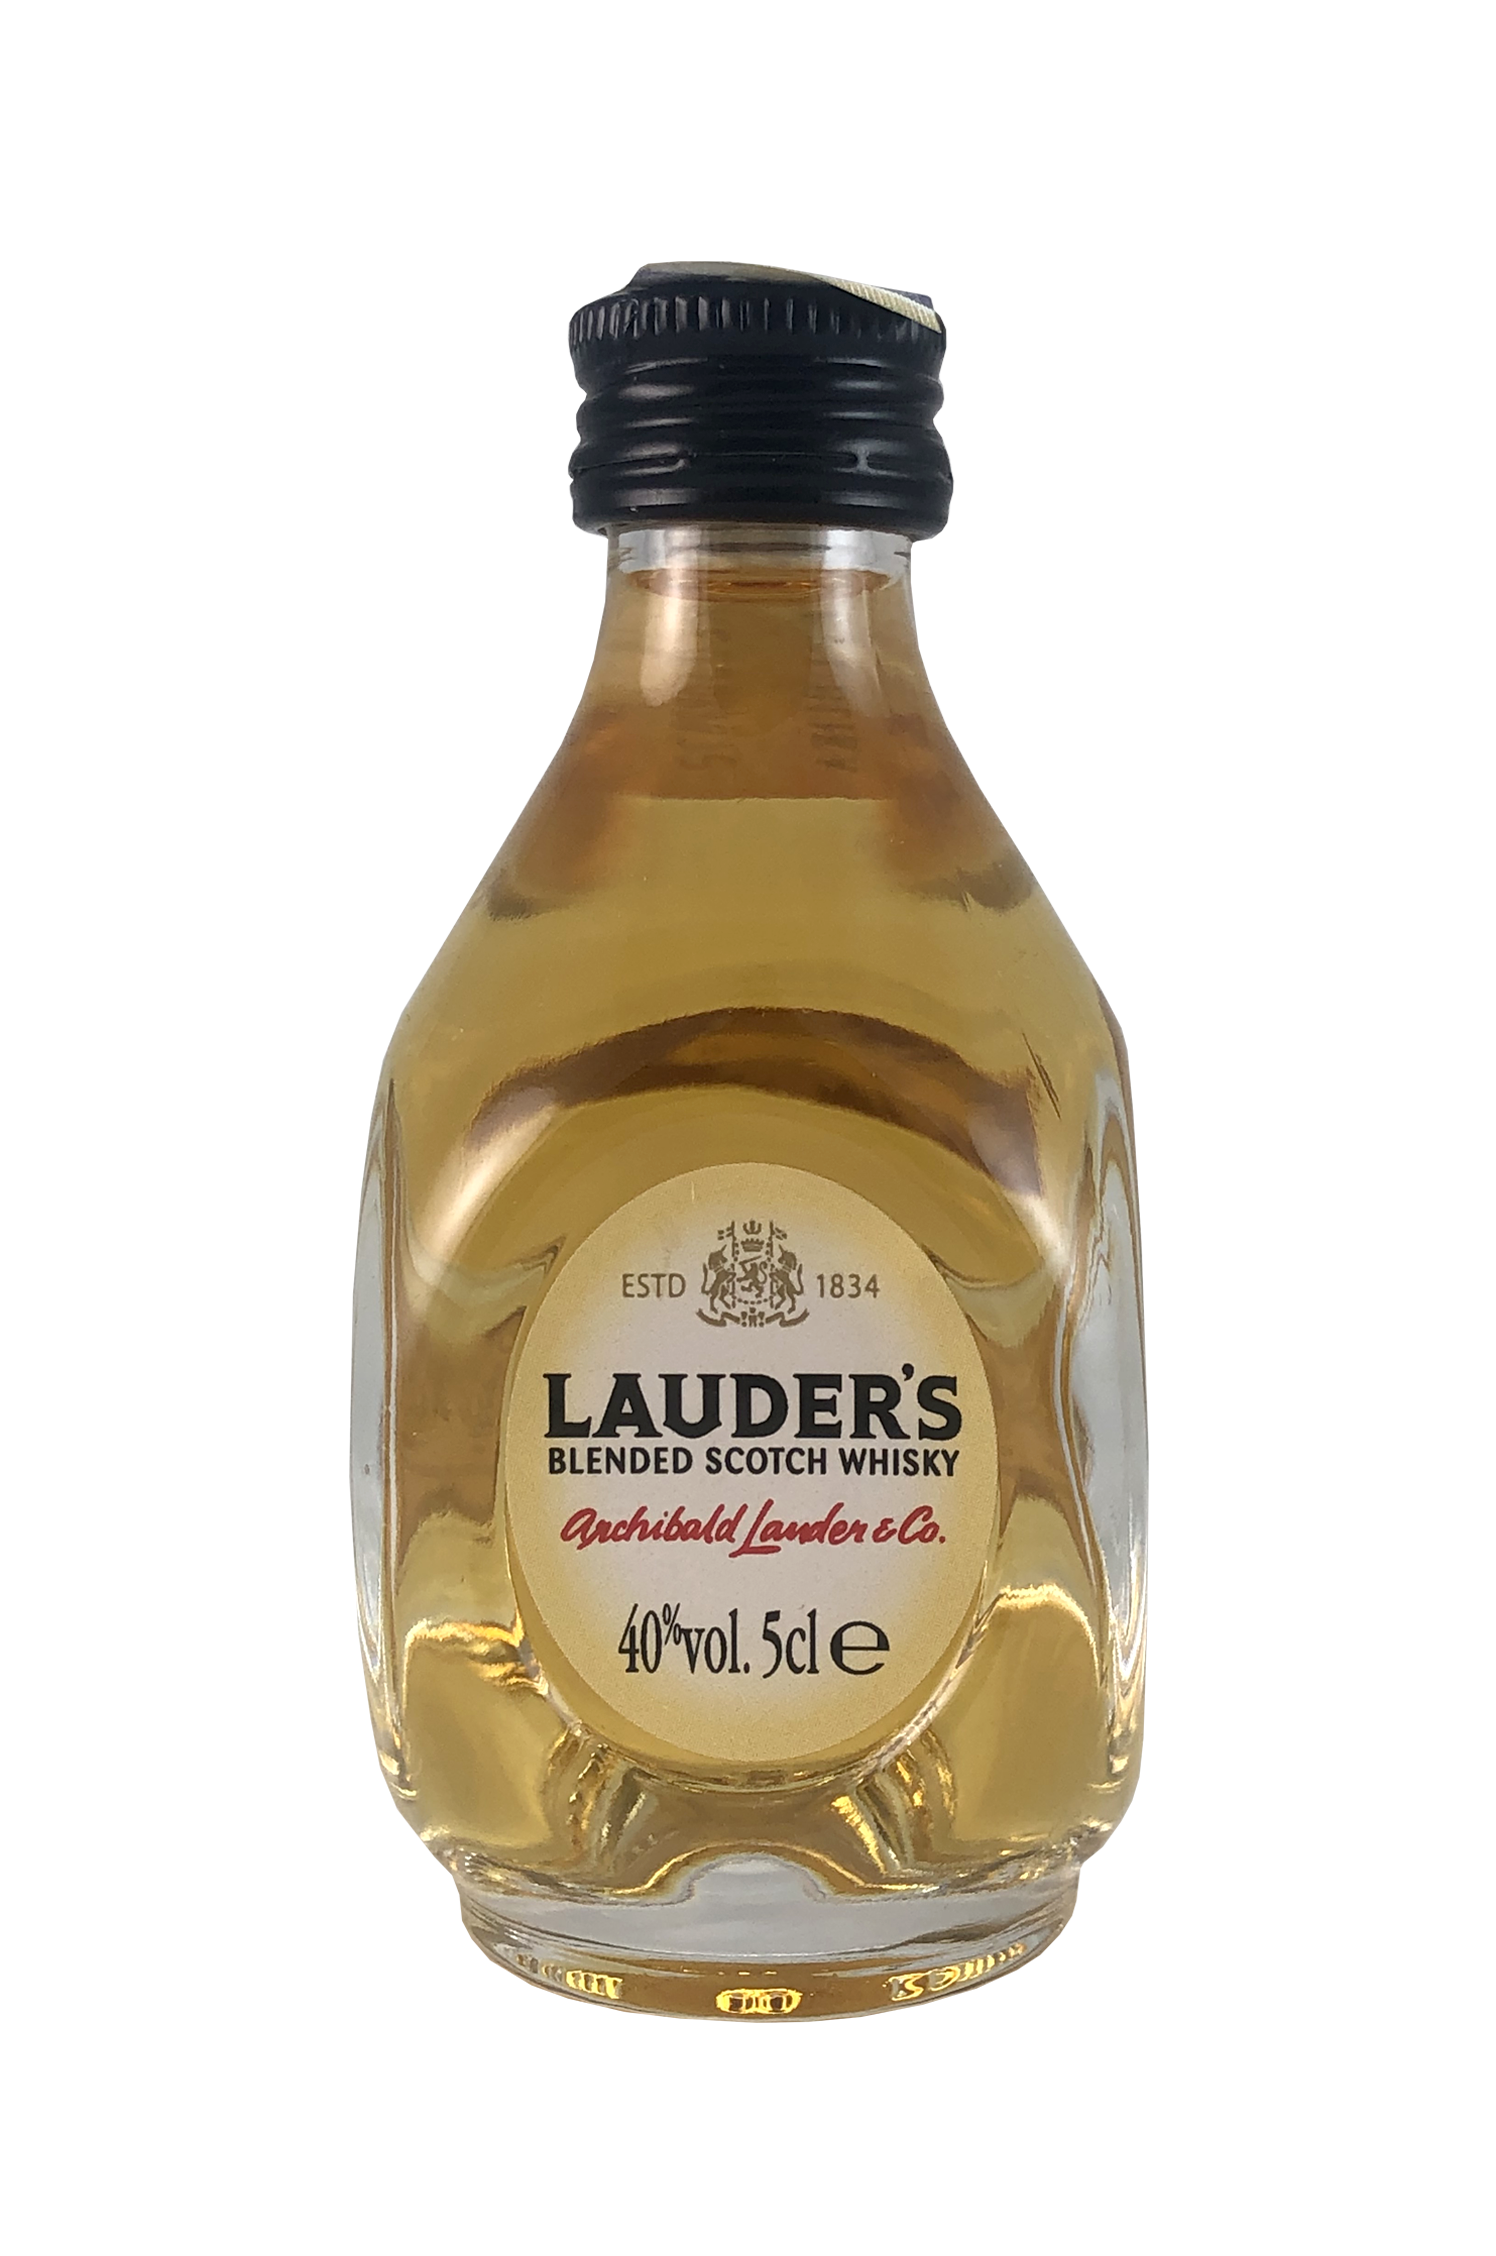 Lauder's Blended Scotch Whisky